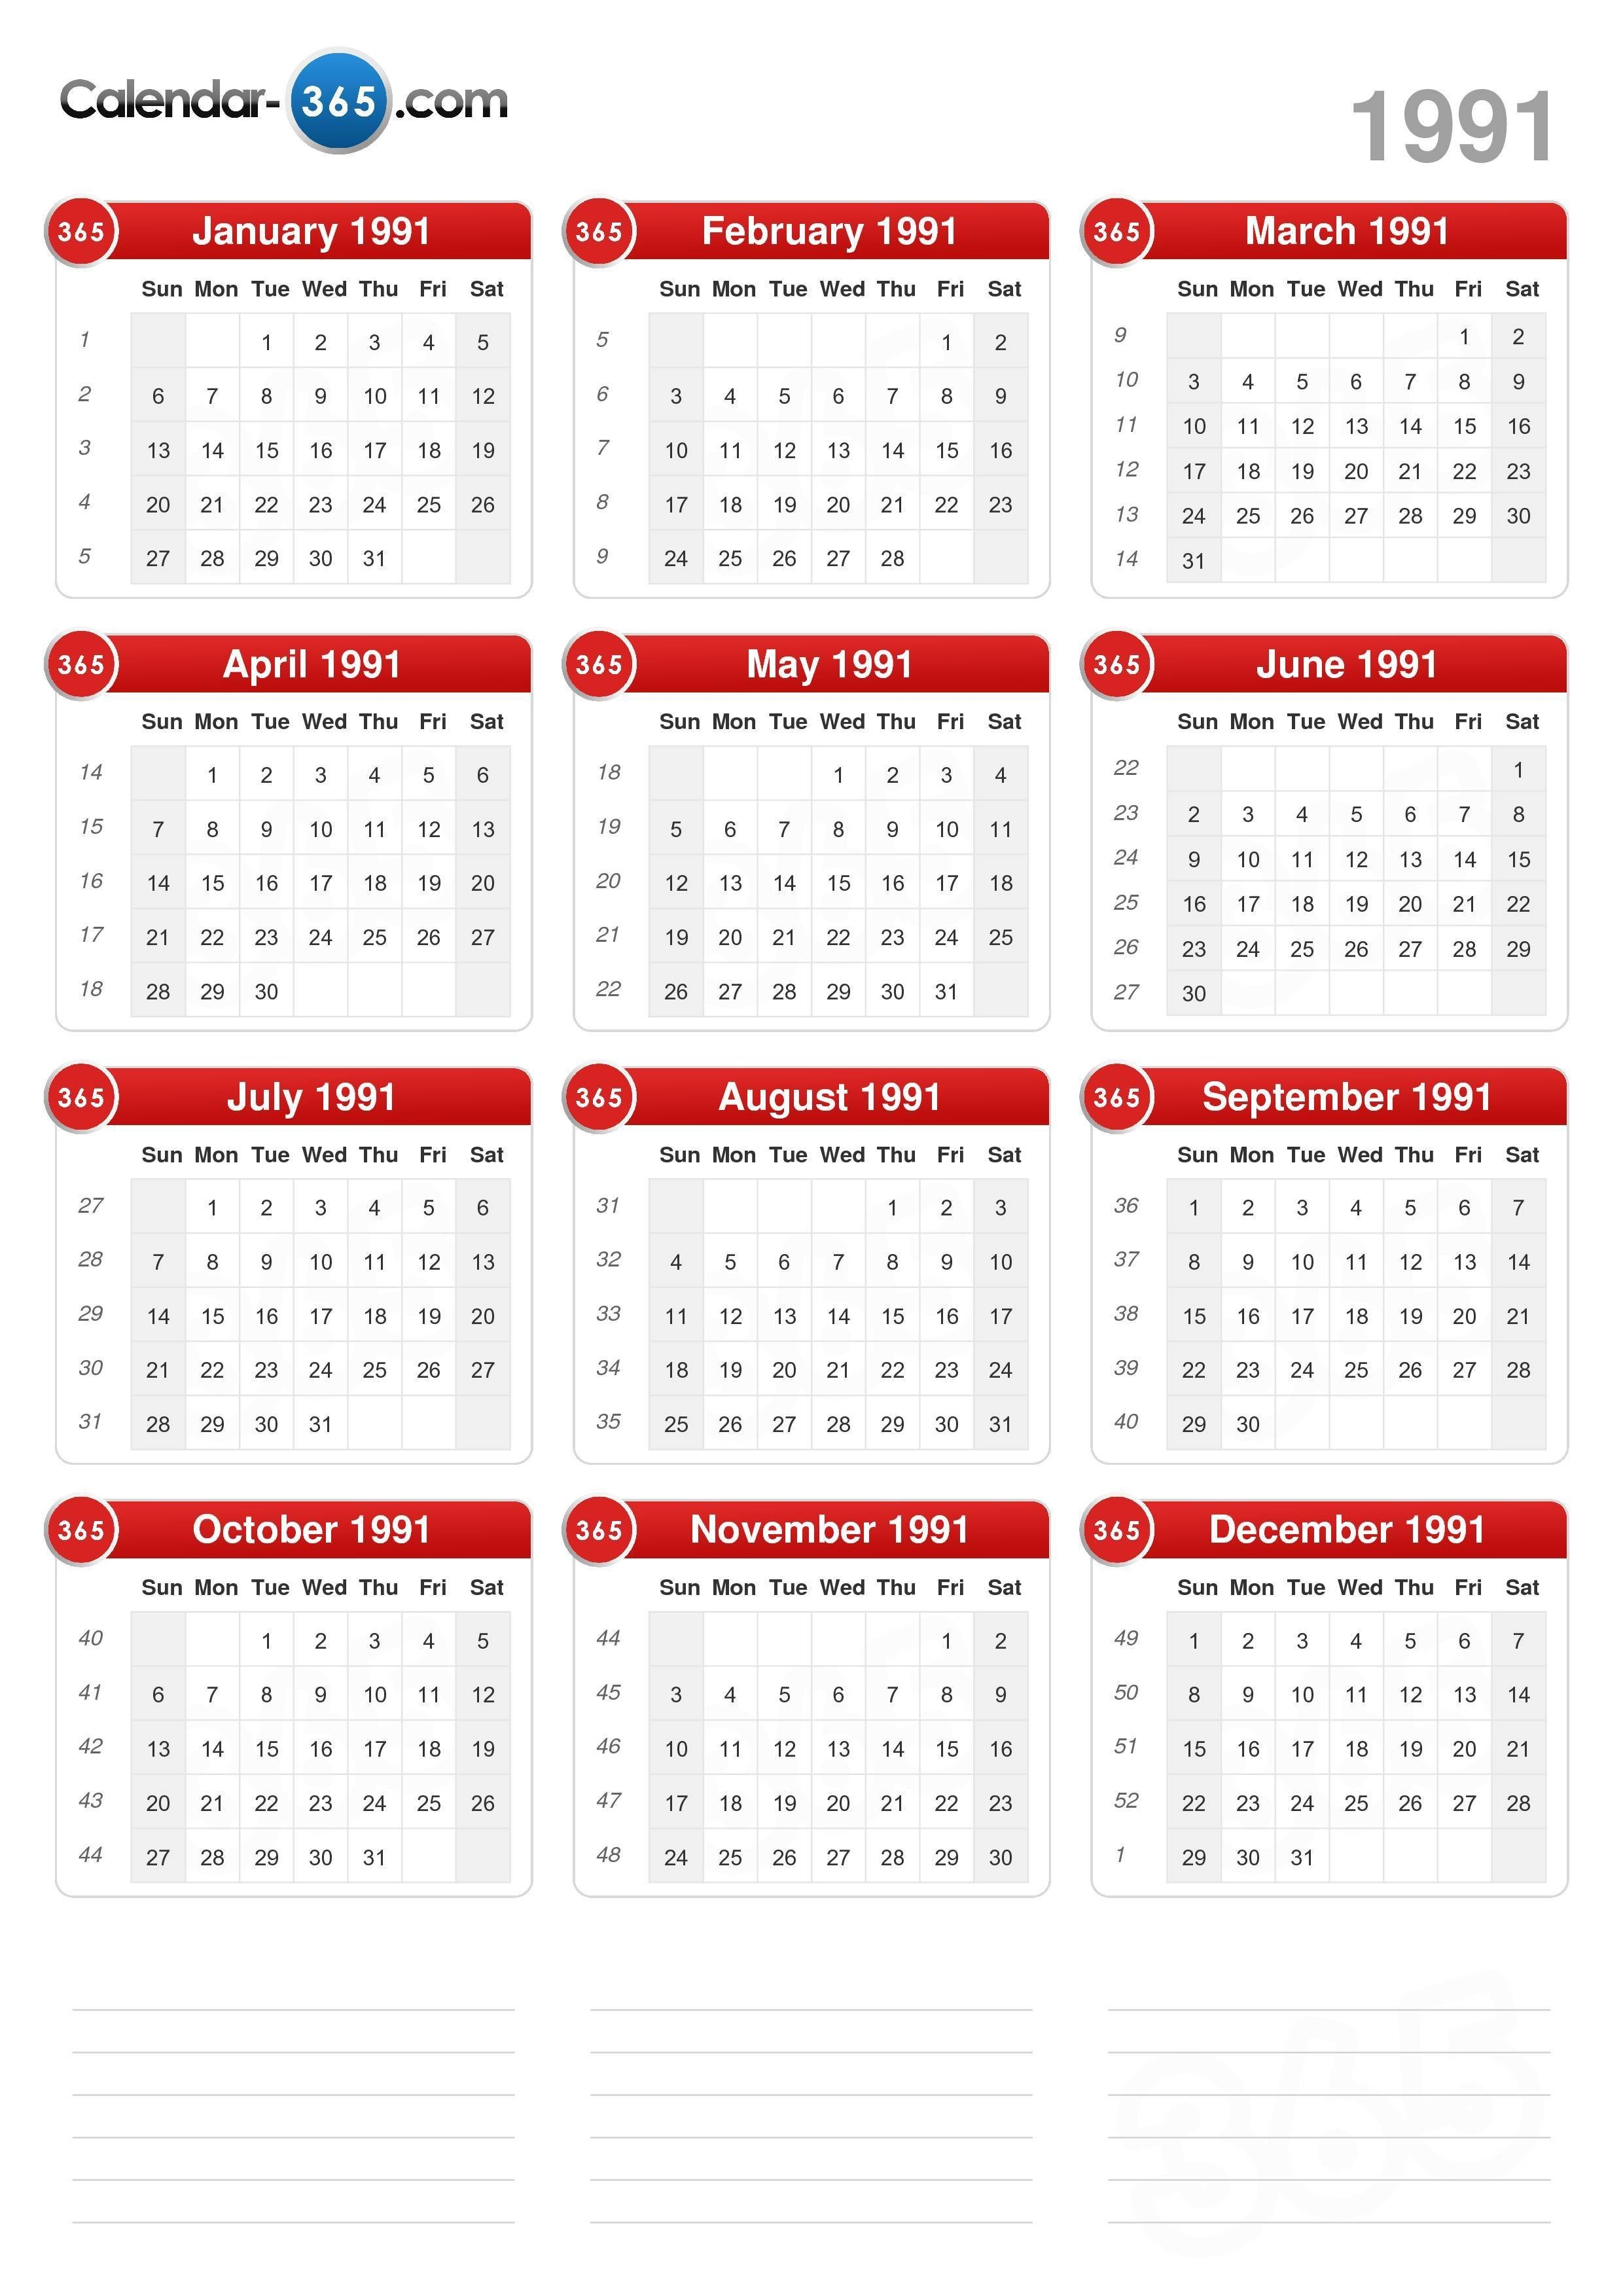 1991 Calendar portrait format v2